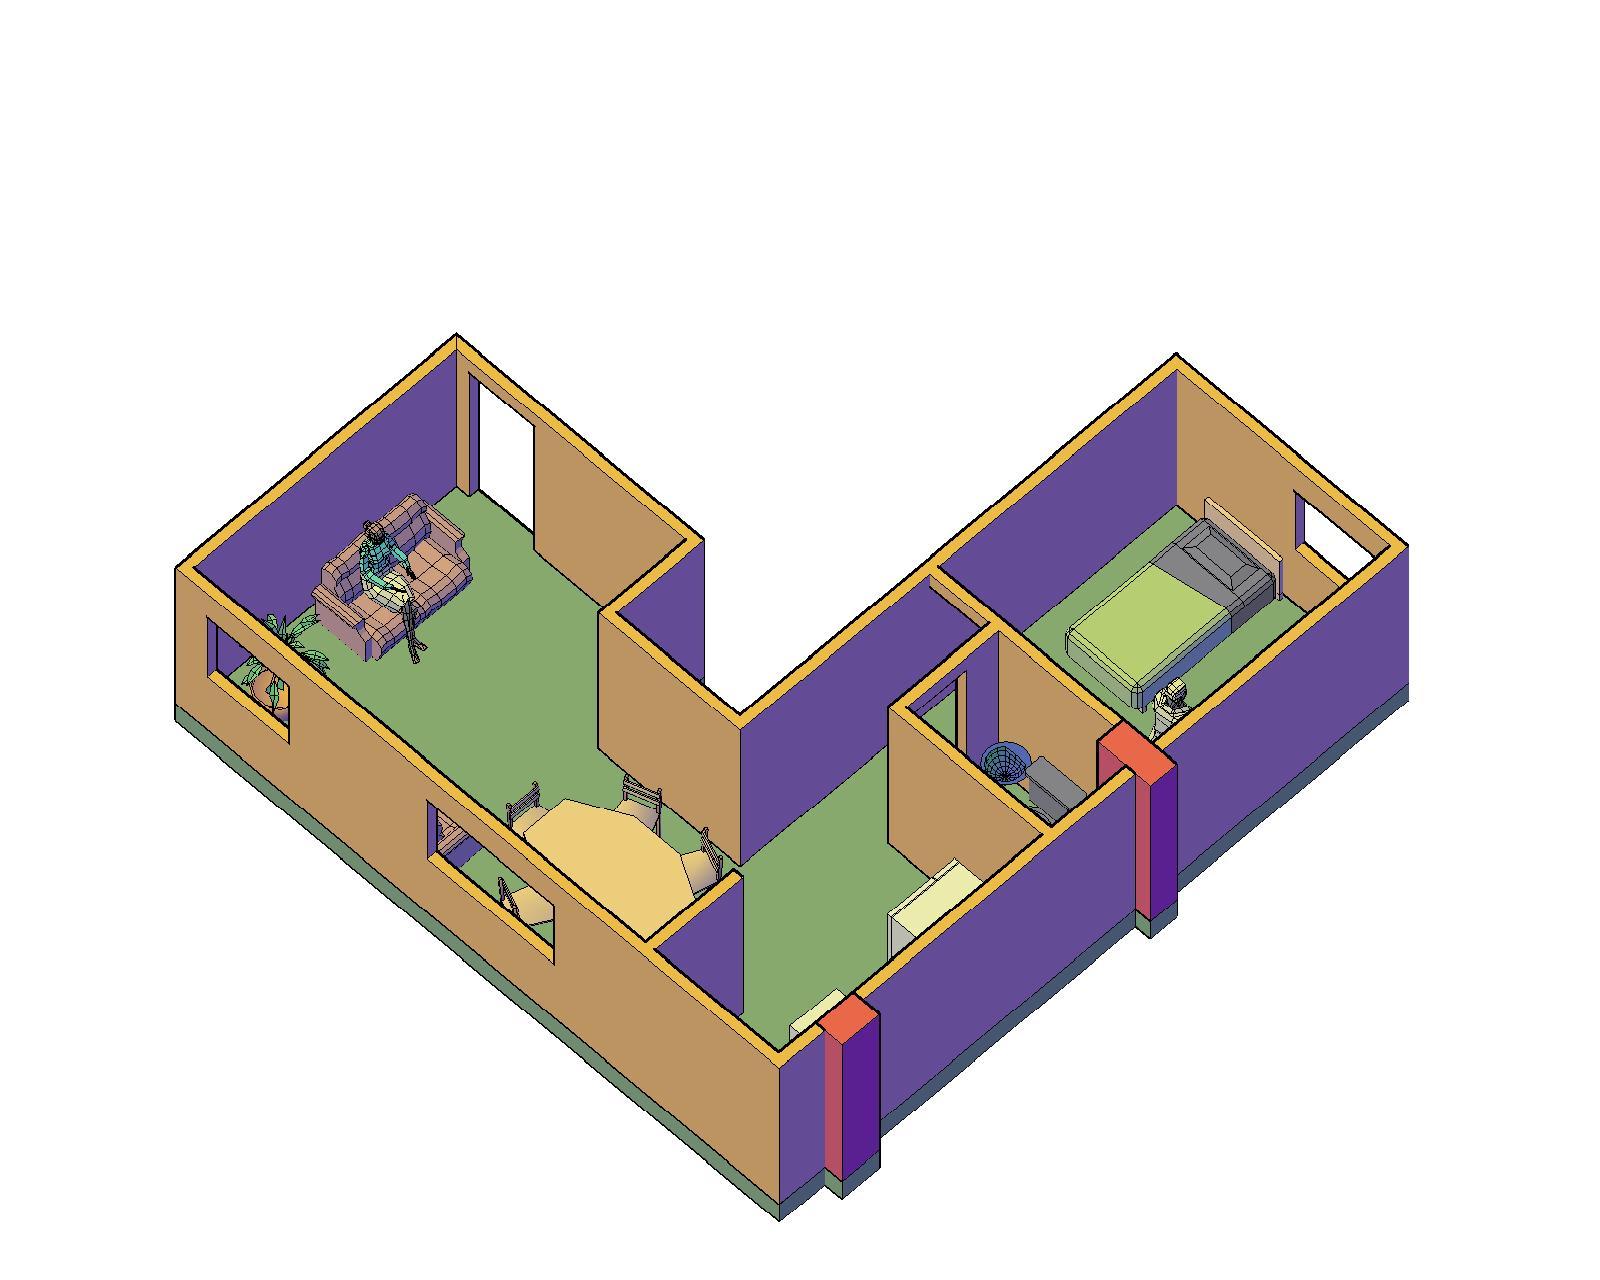 Dibujo asistido por computador aparta estudio for Diseno apartaestudio